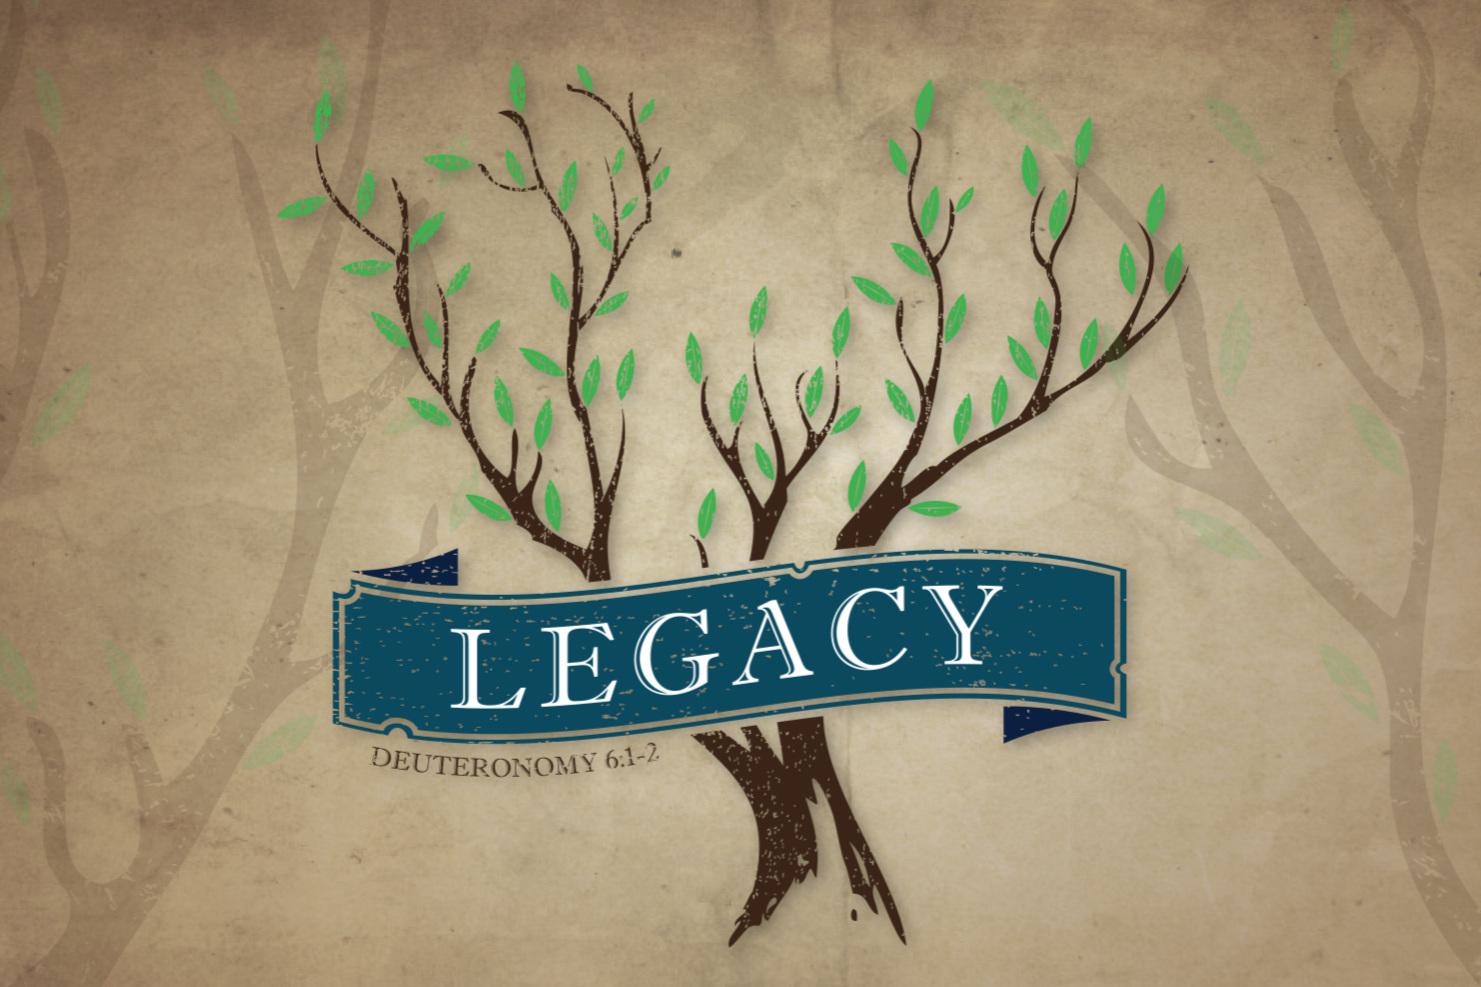 LegacyLogo.jpeg